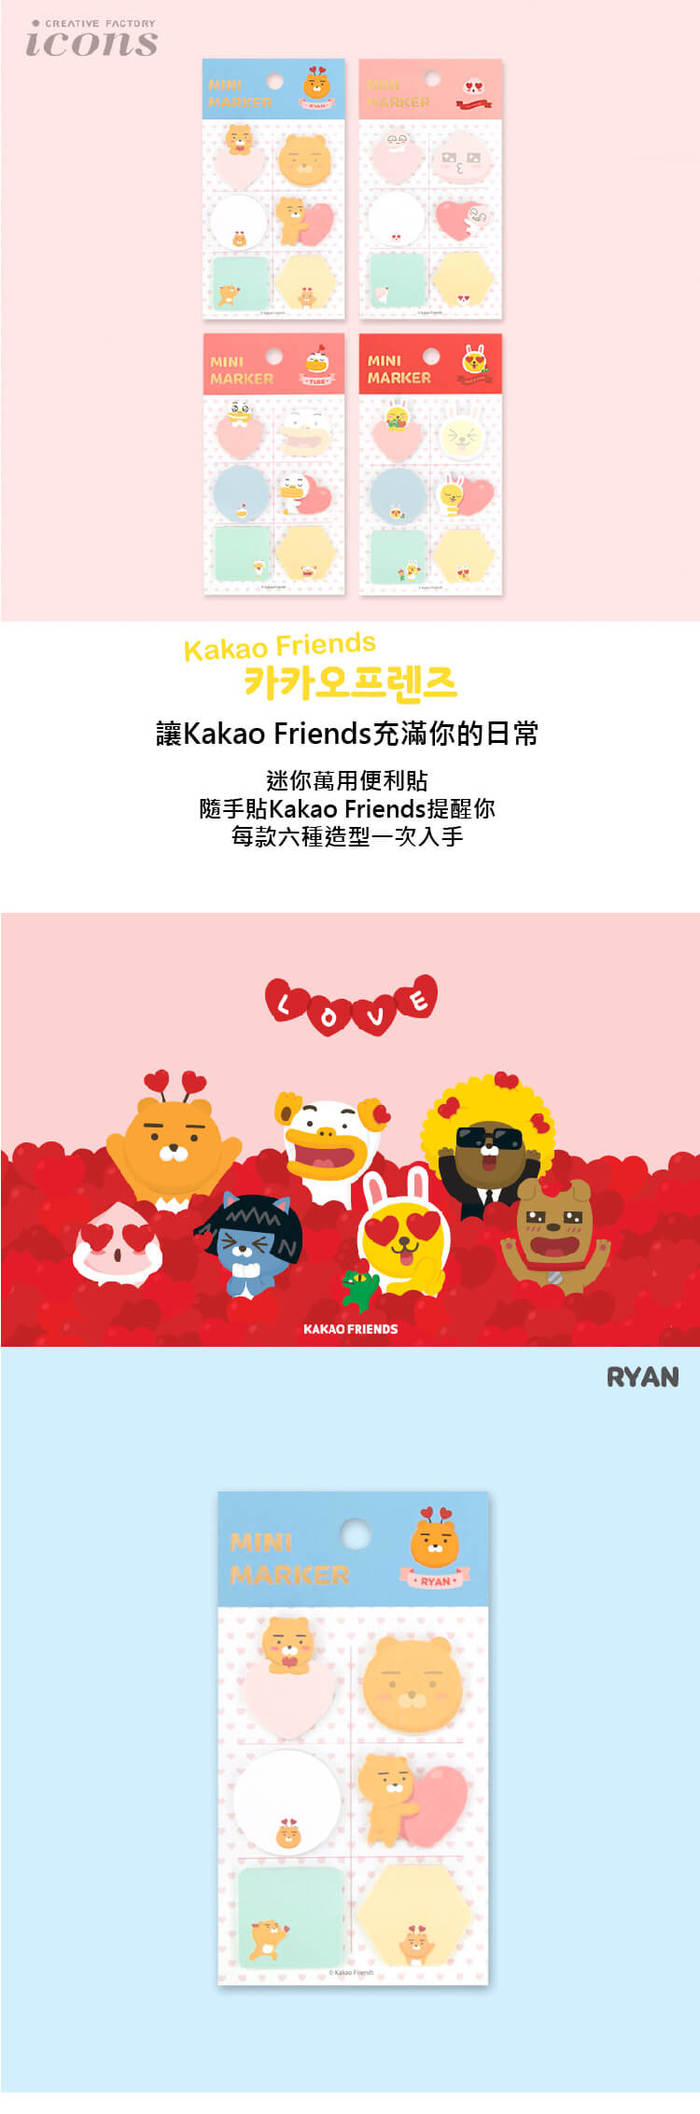 Kakao Friends 迷你萬用便條貼 MUZI